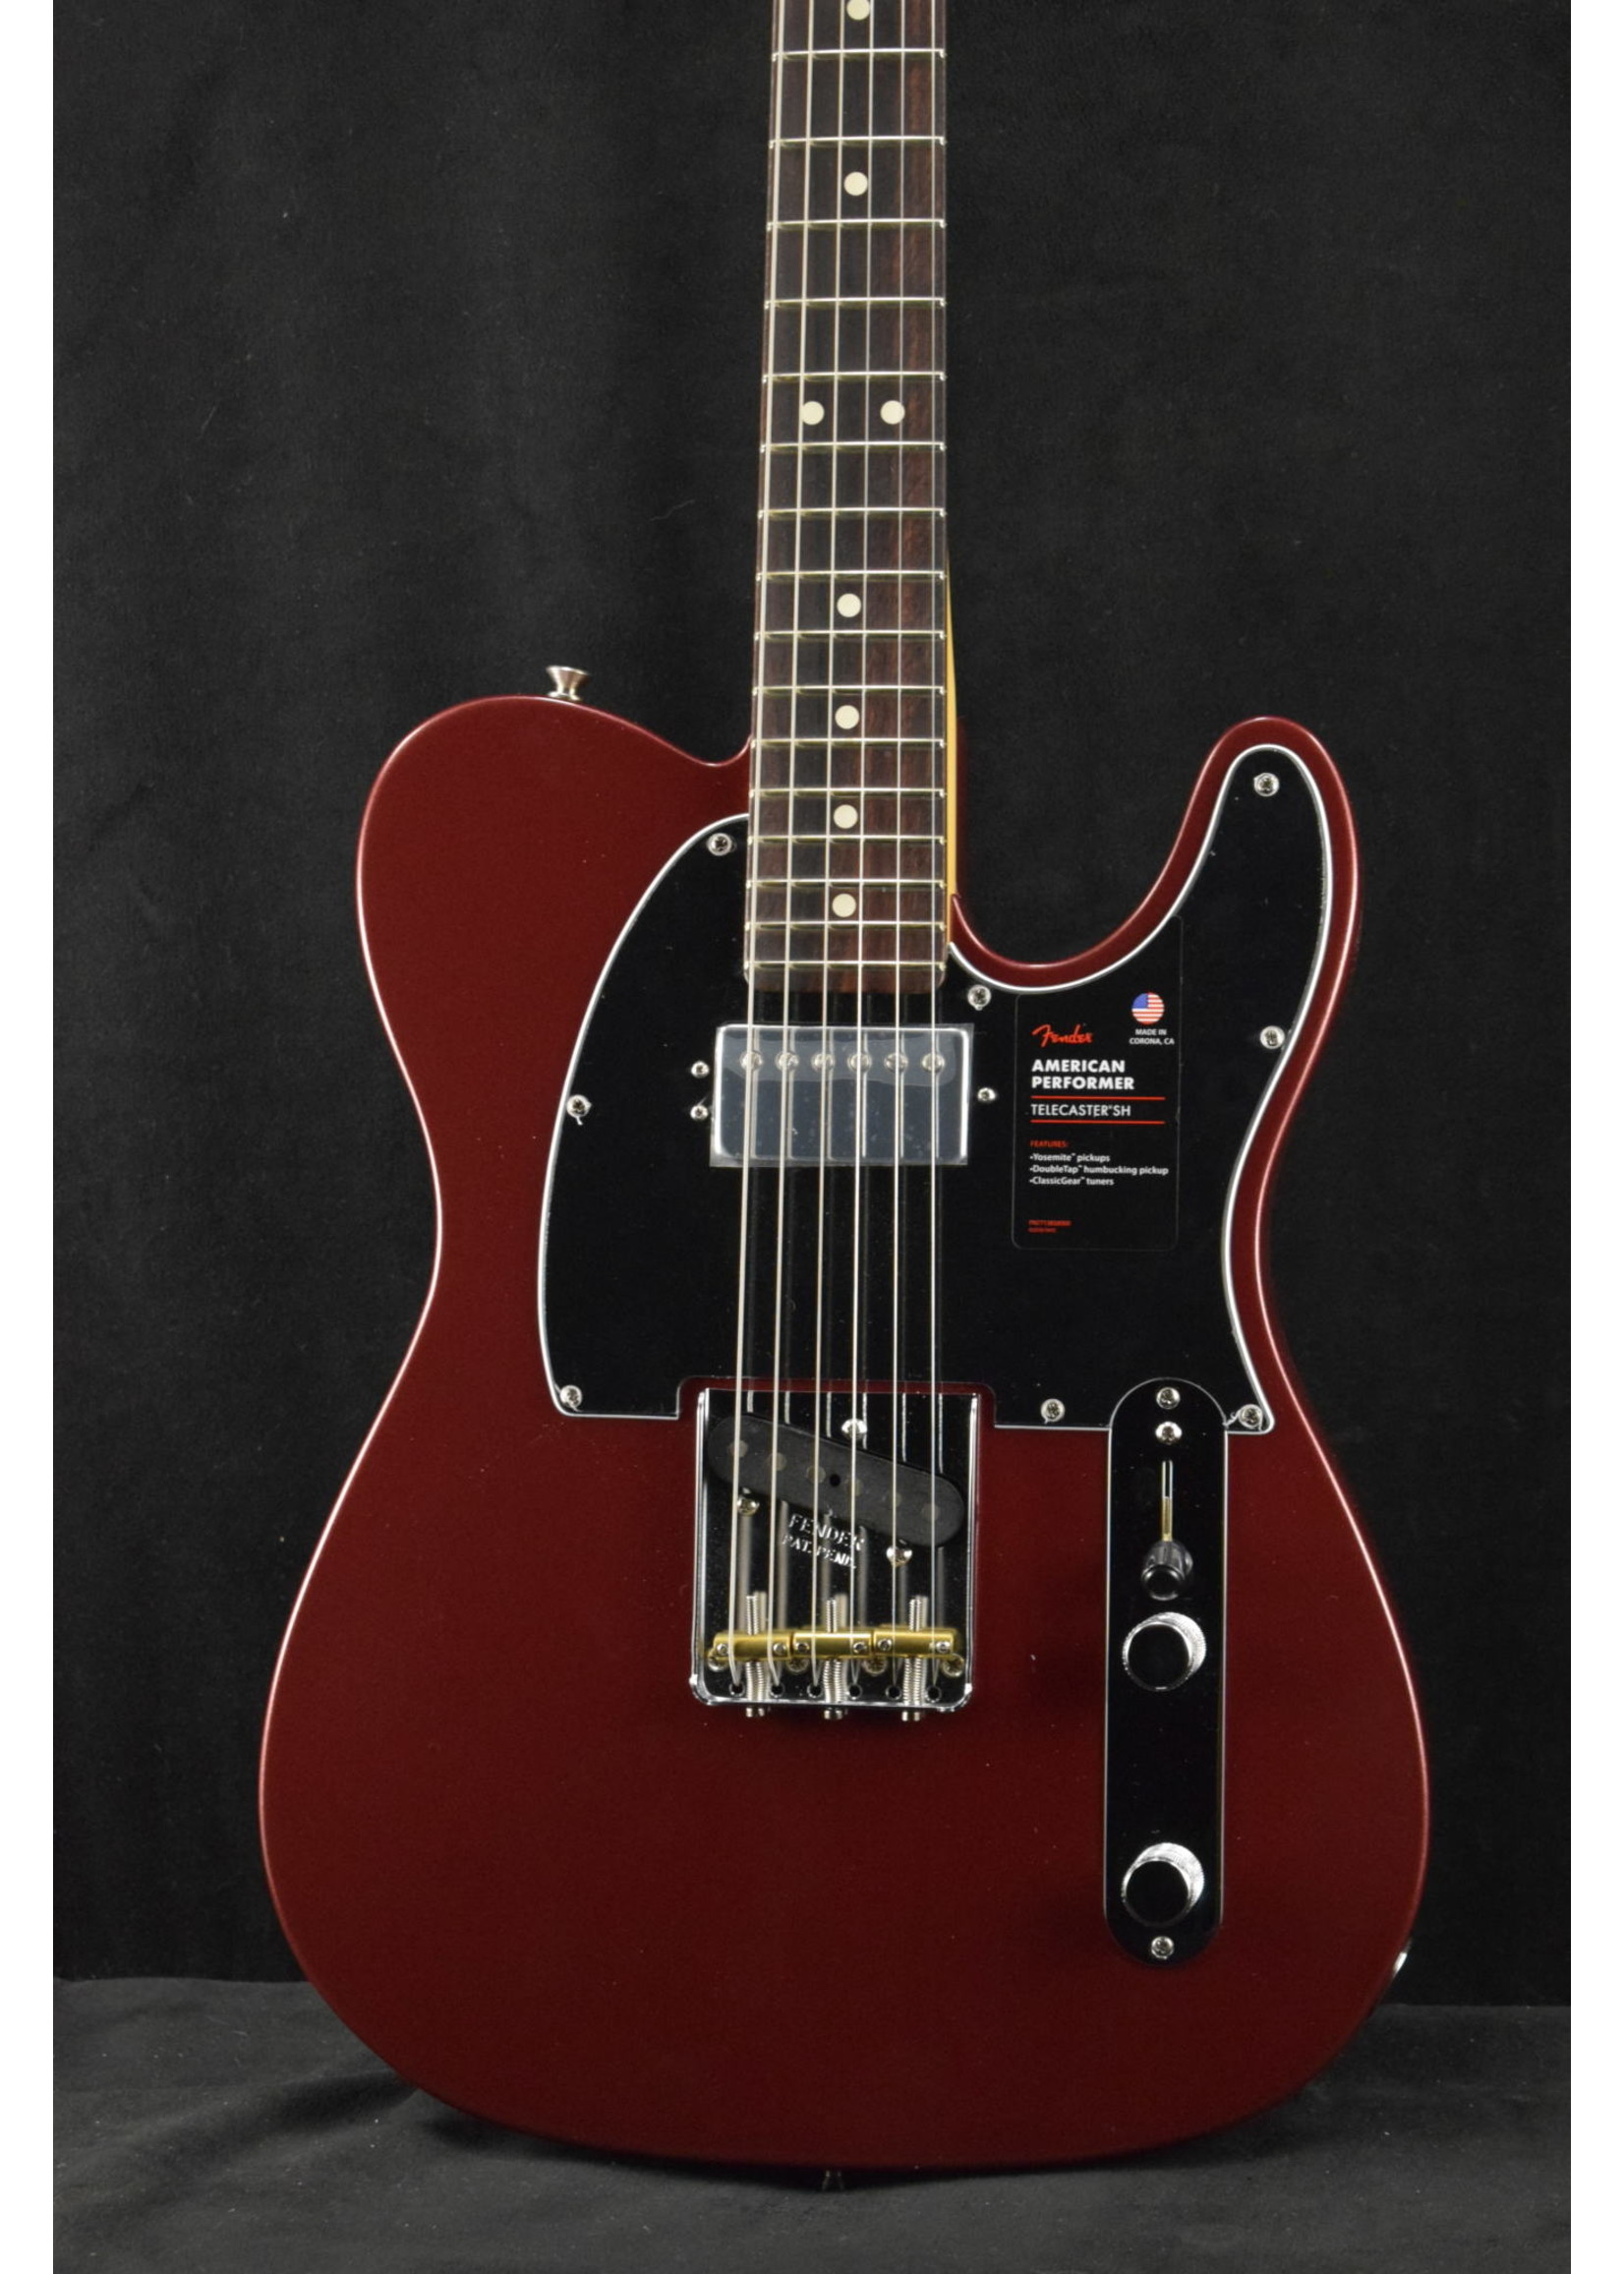 Fender Fender American Performer Telecaster with Humbucking Pickup Aubergine